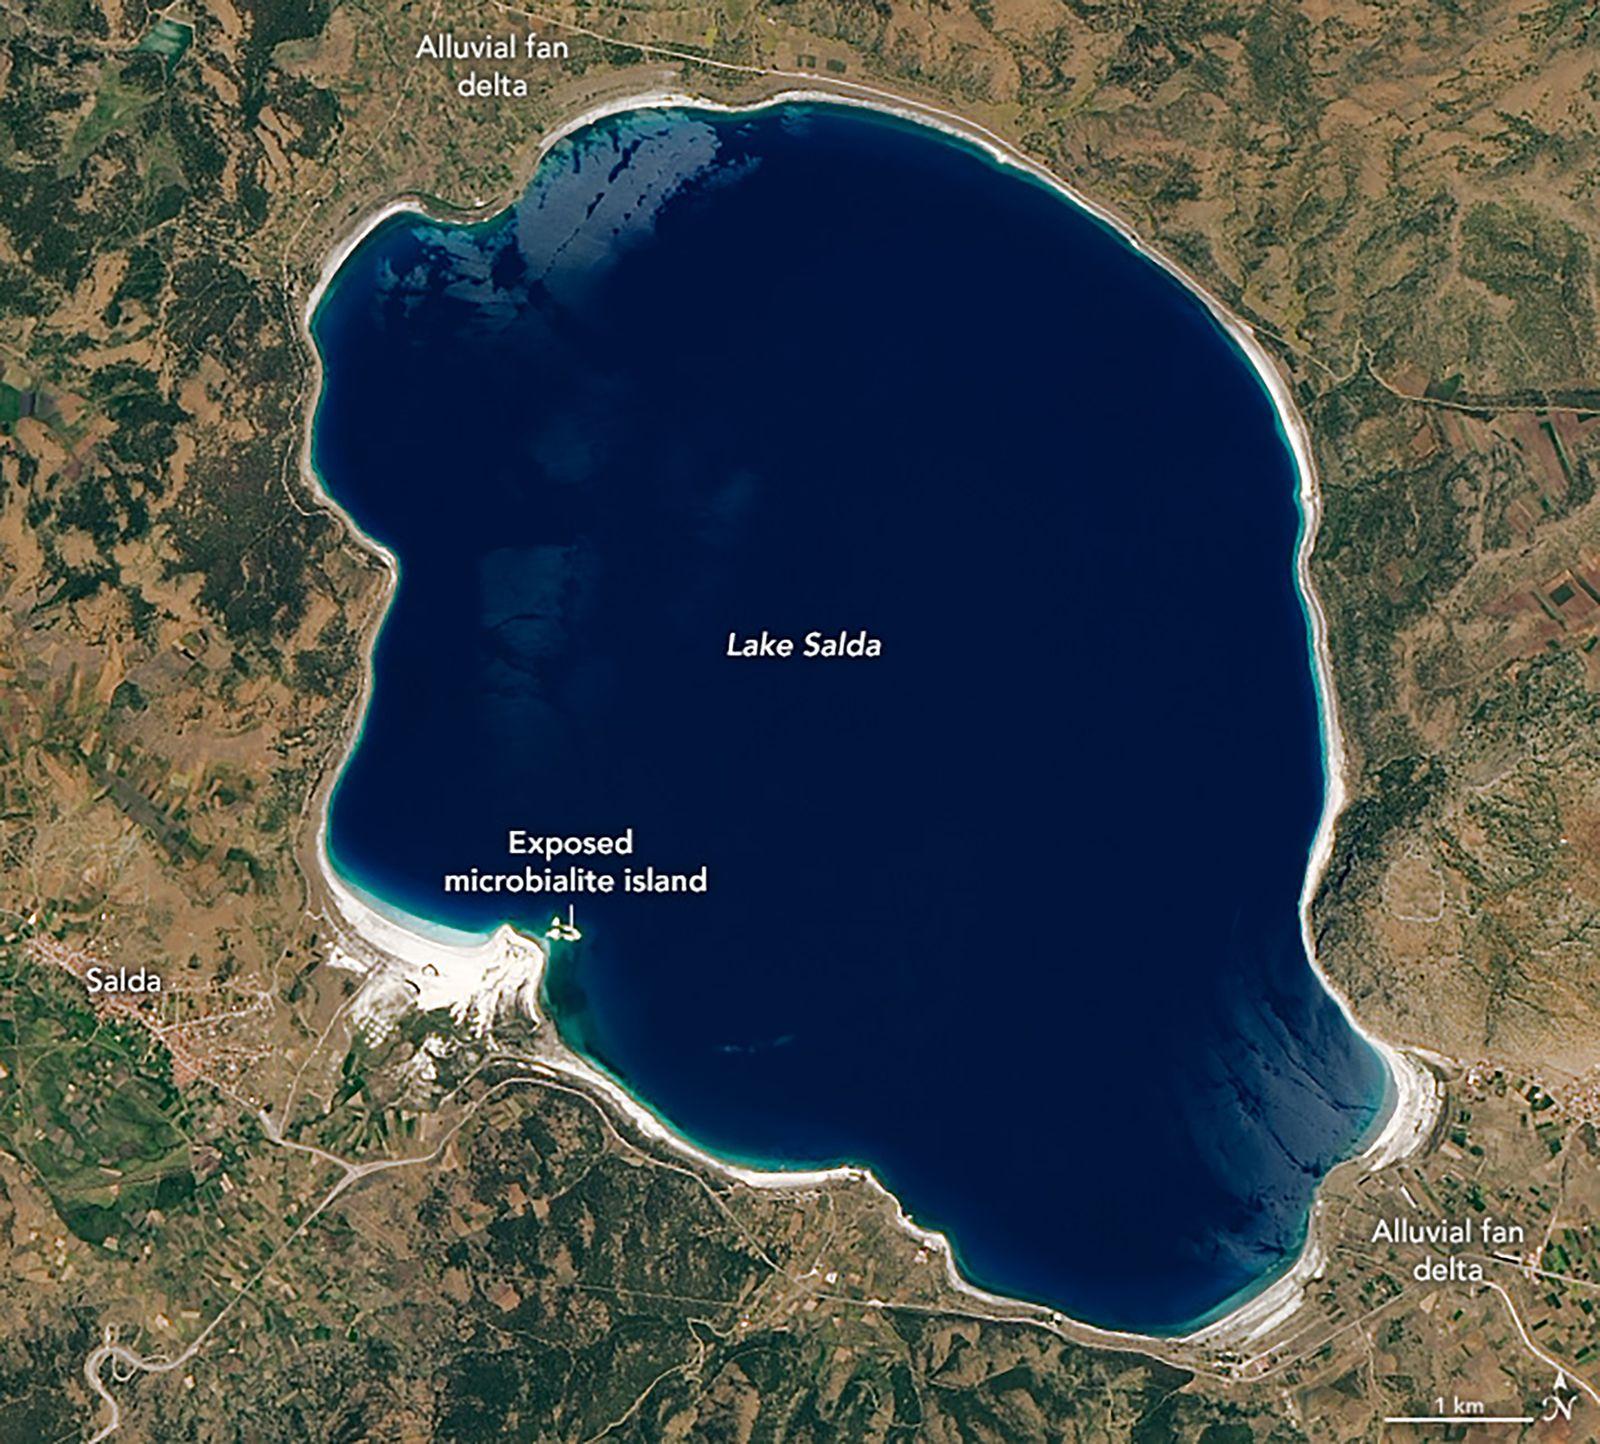 Lake Salda, Turkey, shares similar mineralogy as Jezero Crater on Mars